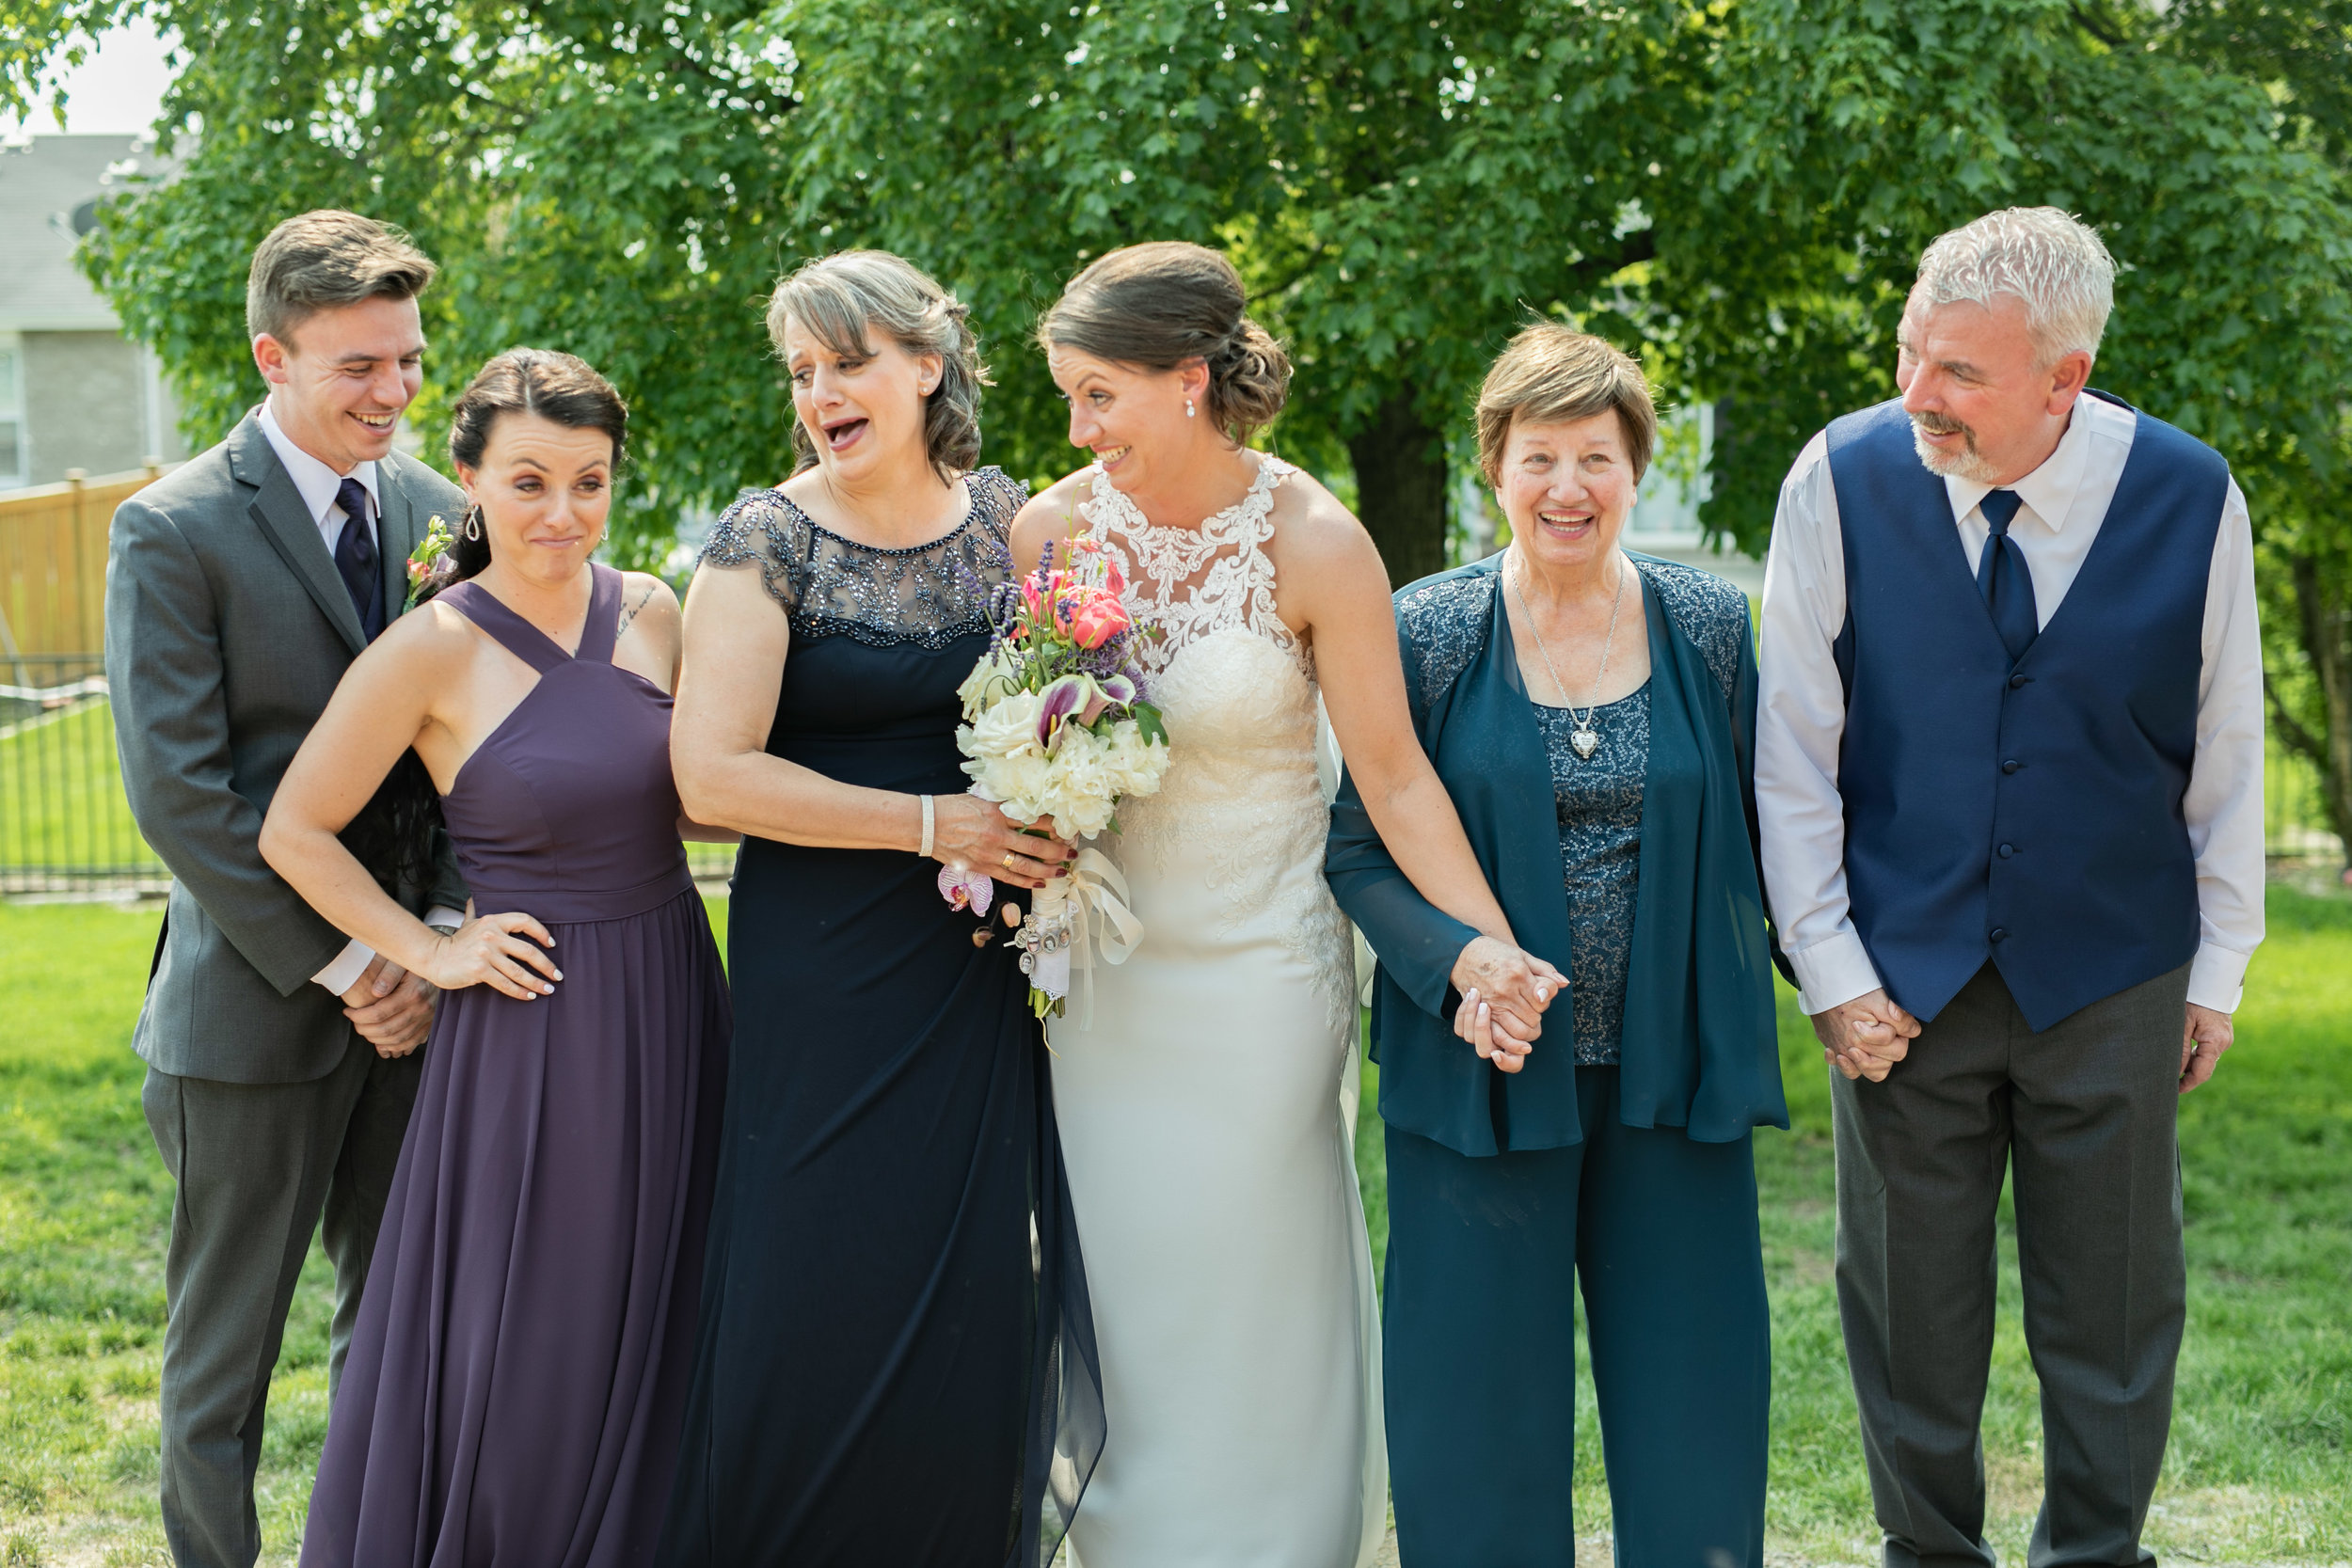 silver-lake-orland-park-wedding17.jpg